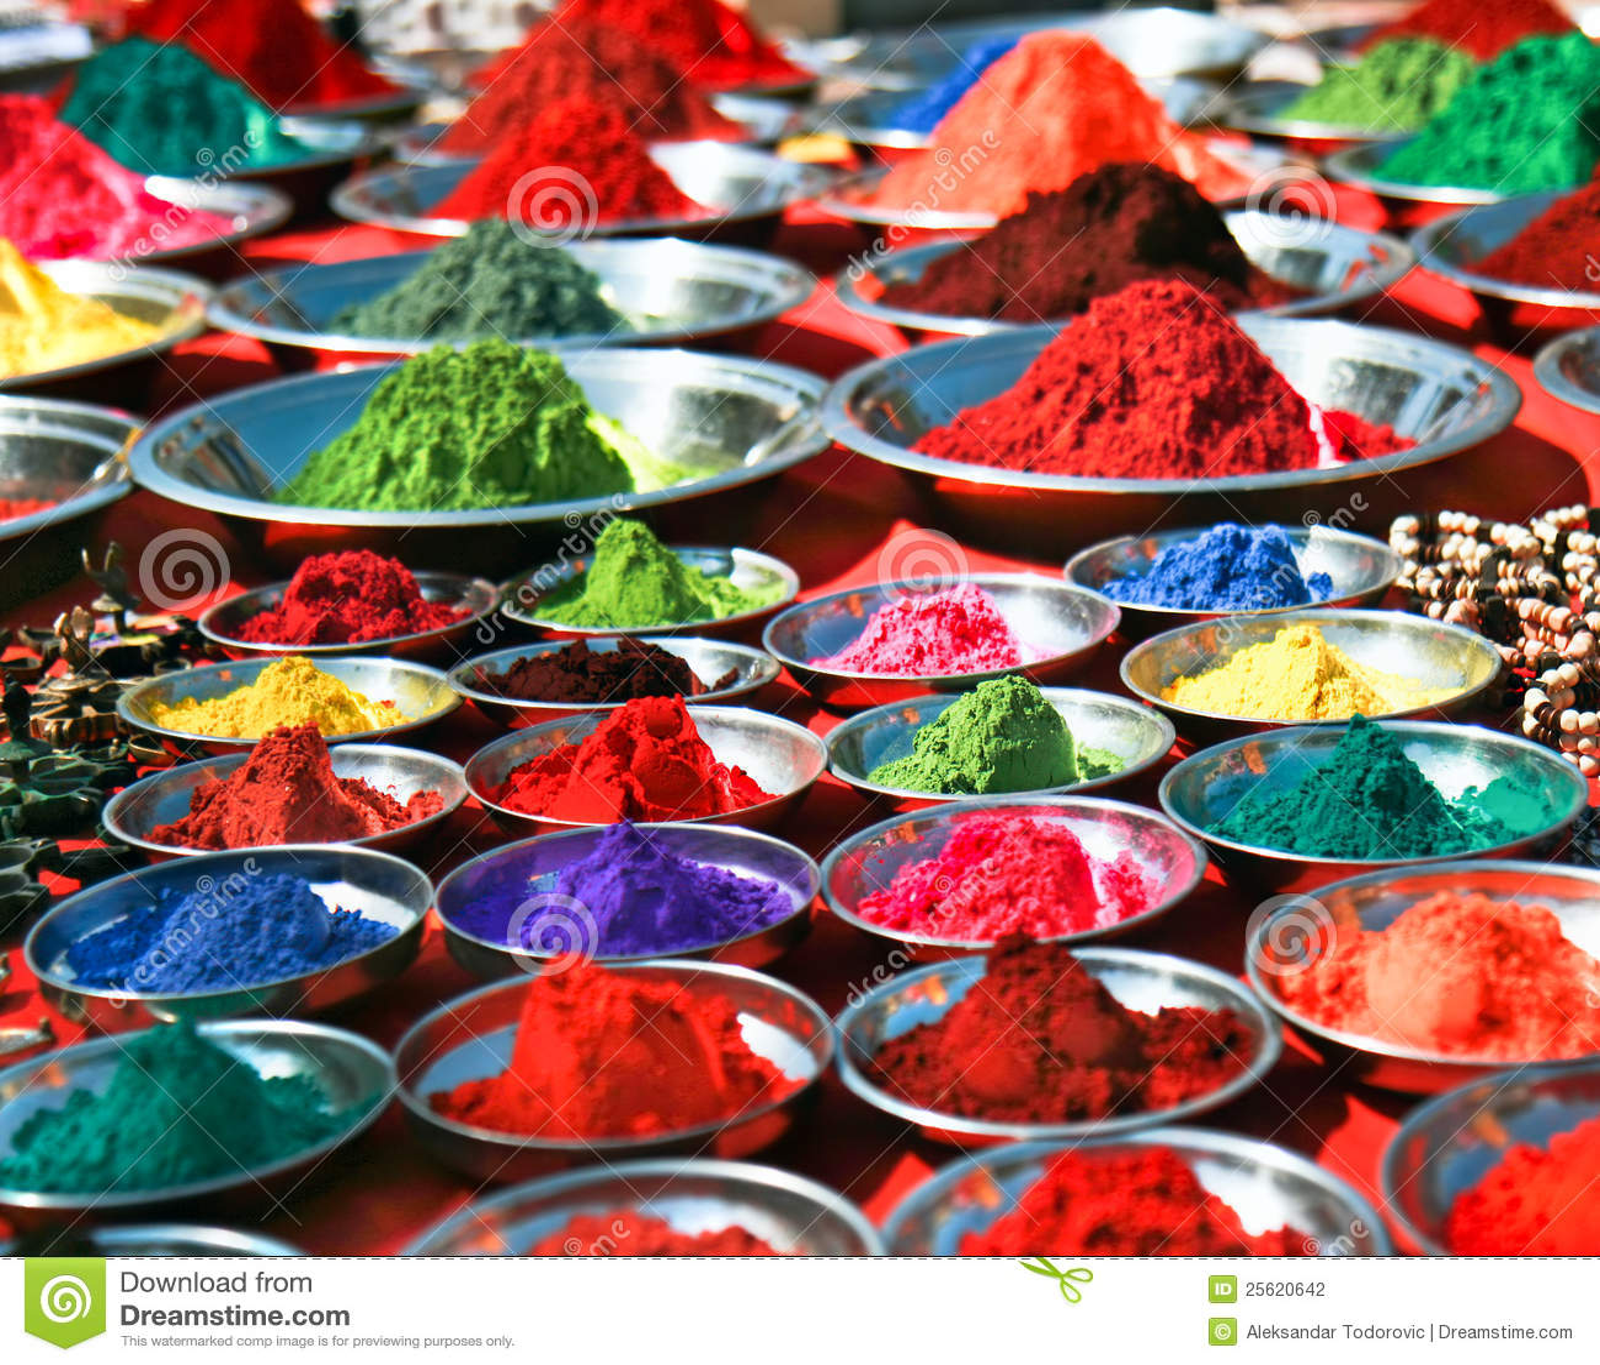 Colorful tika powders on indian market, India